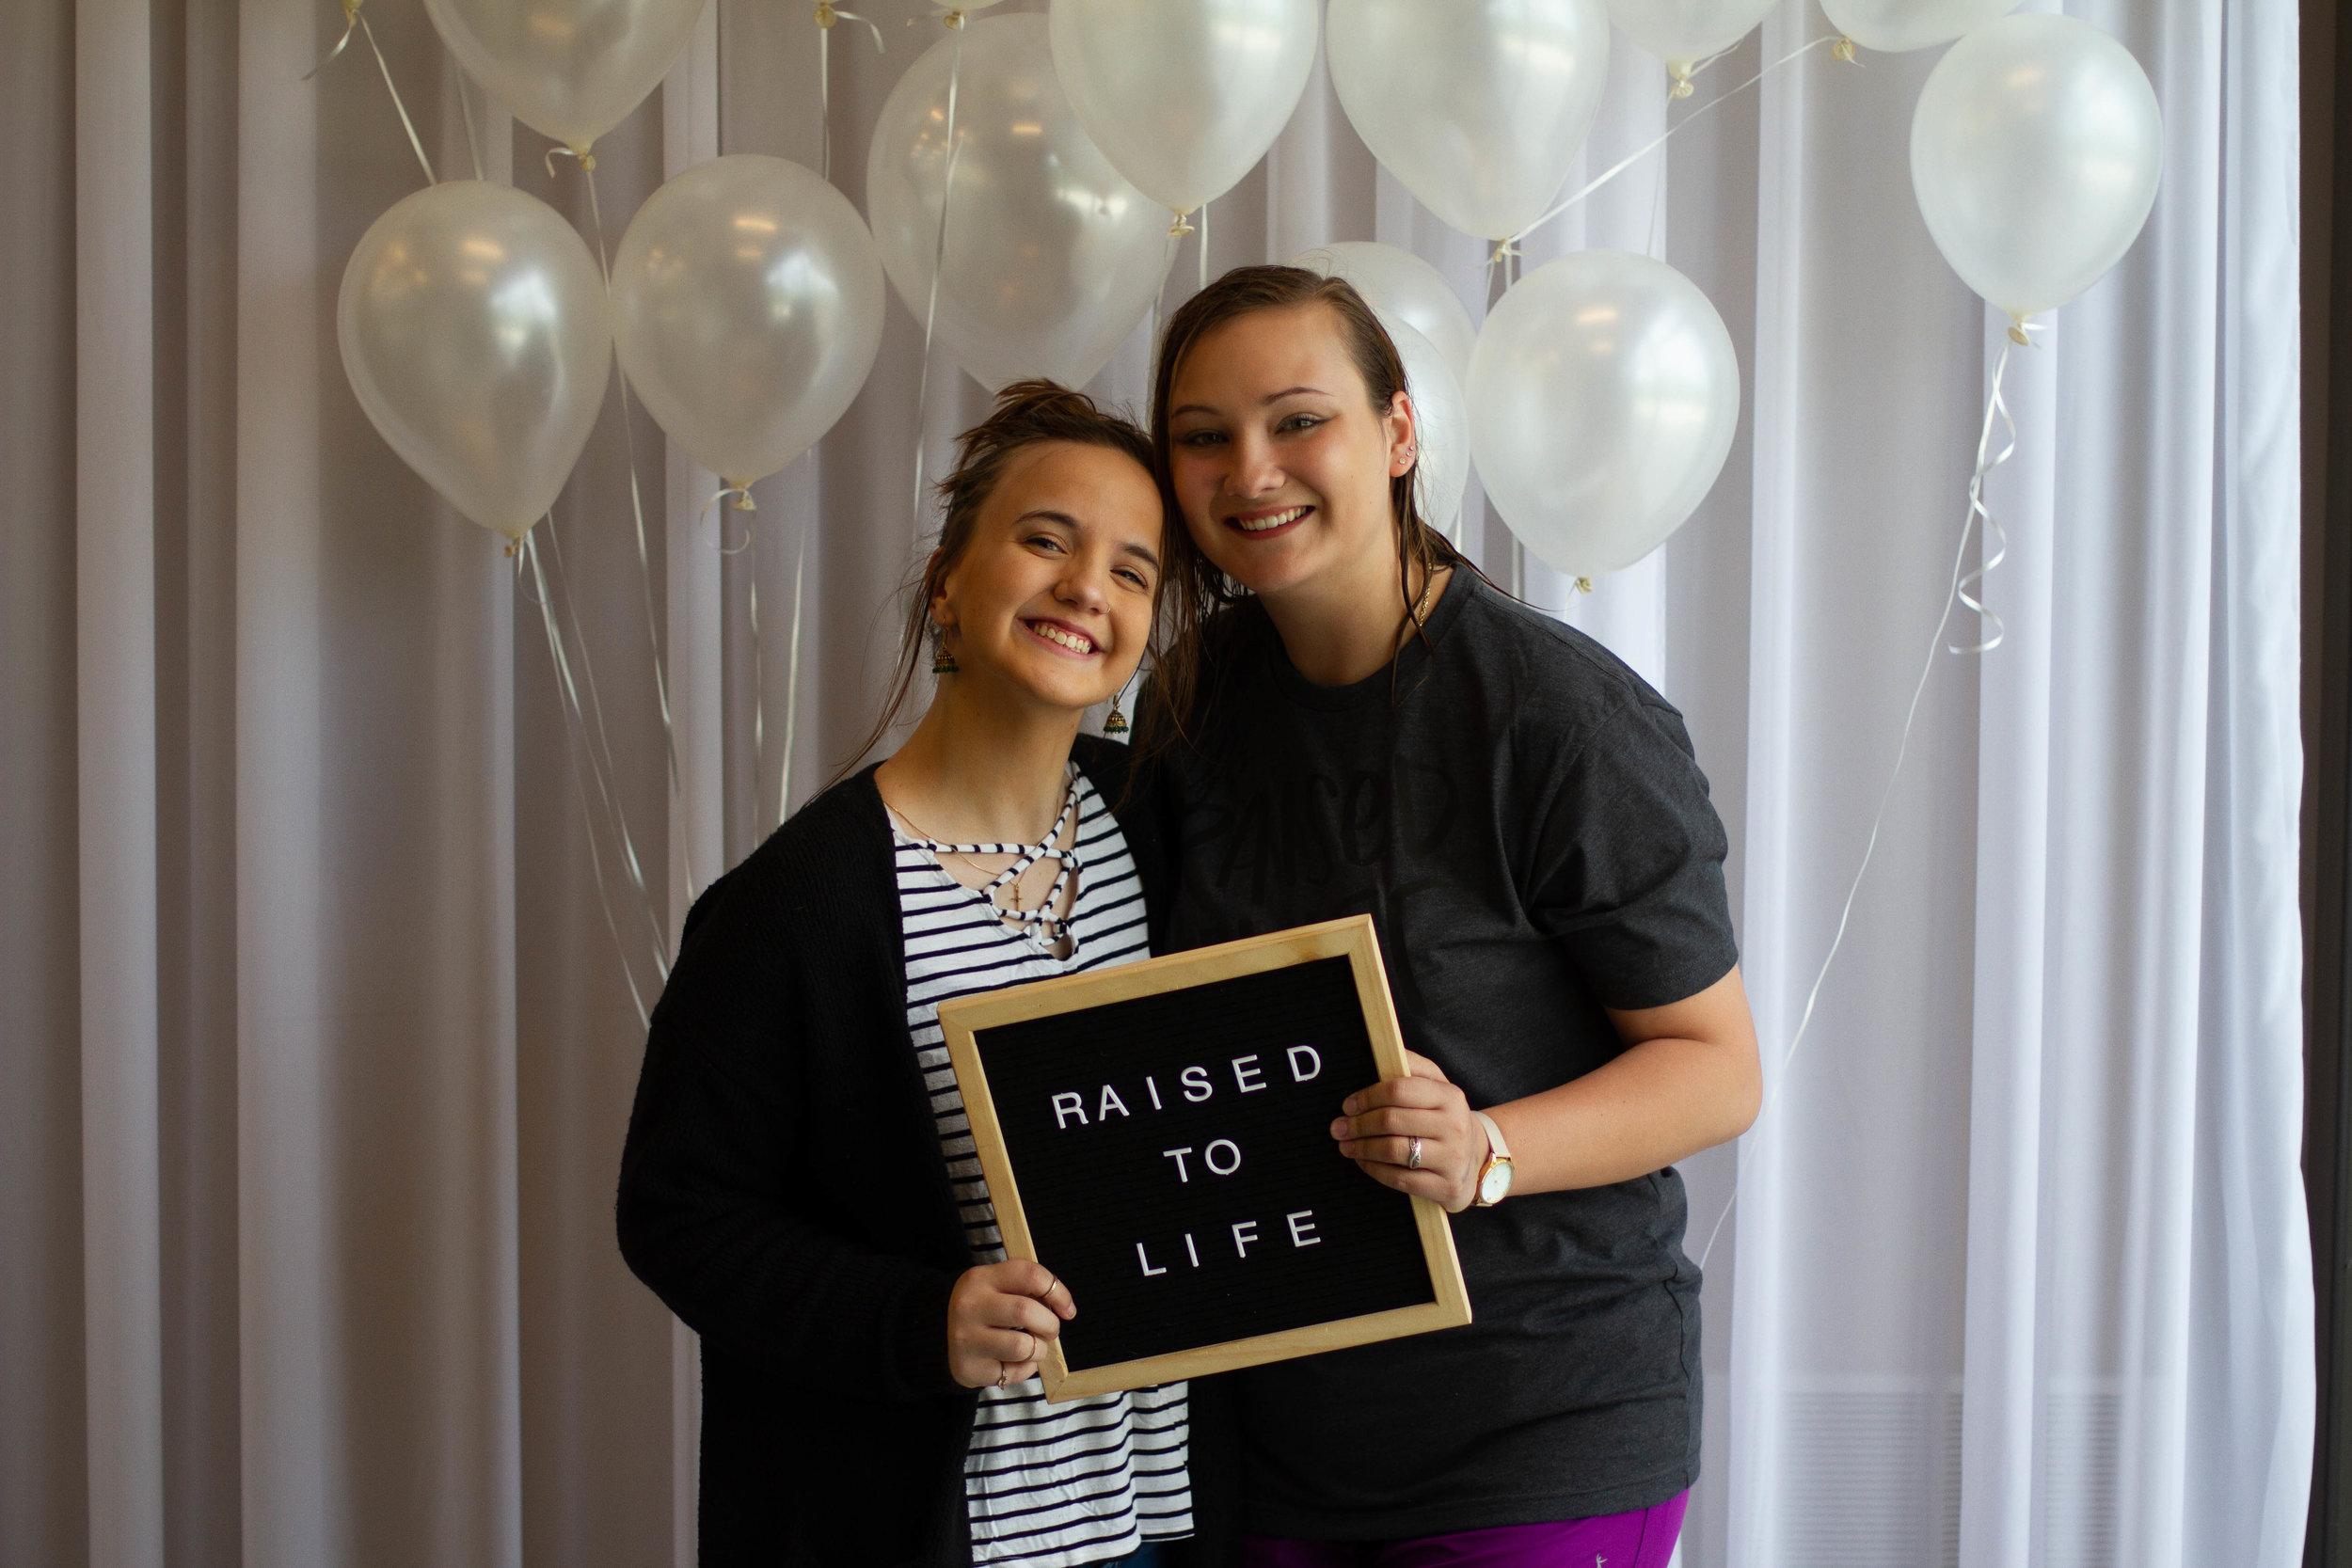 Raised to life Baptisms-13.jpg